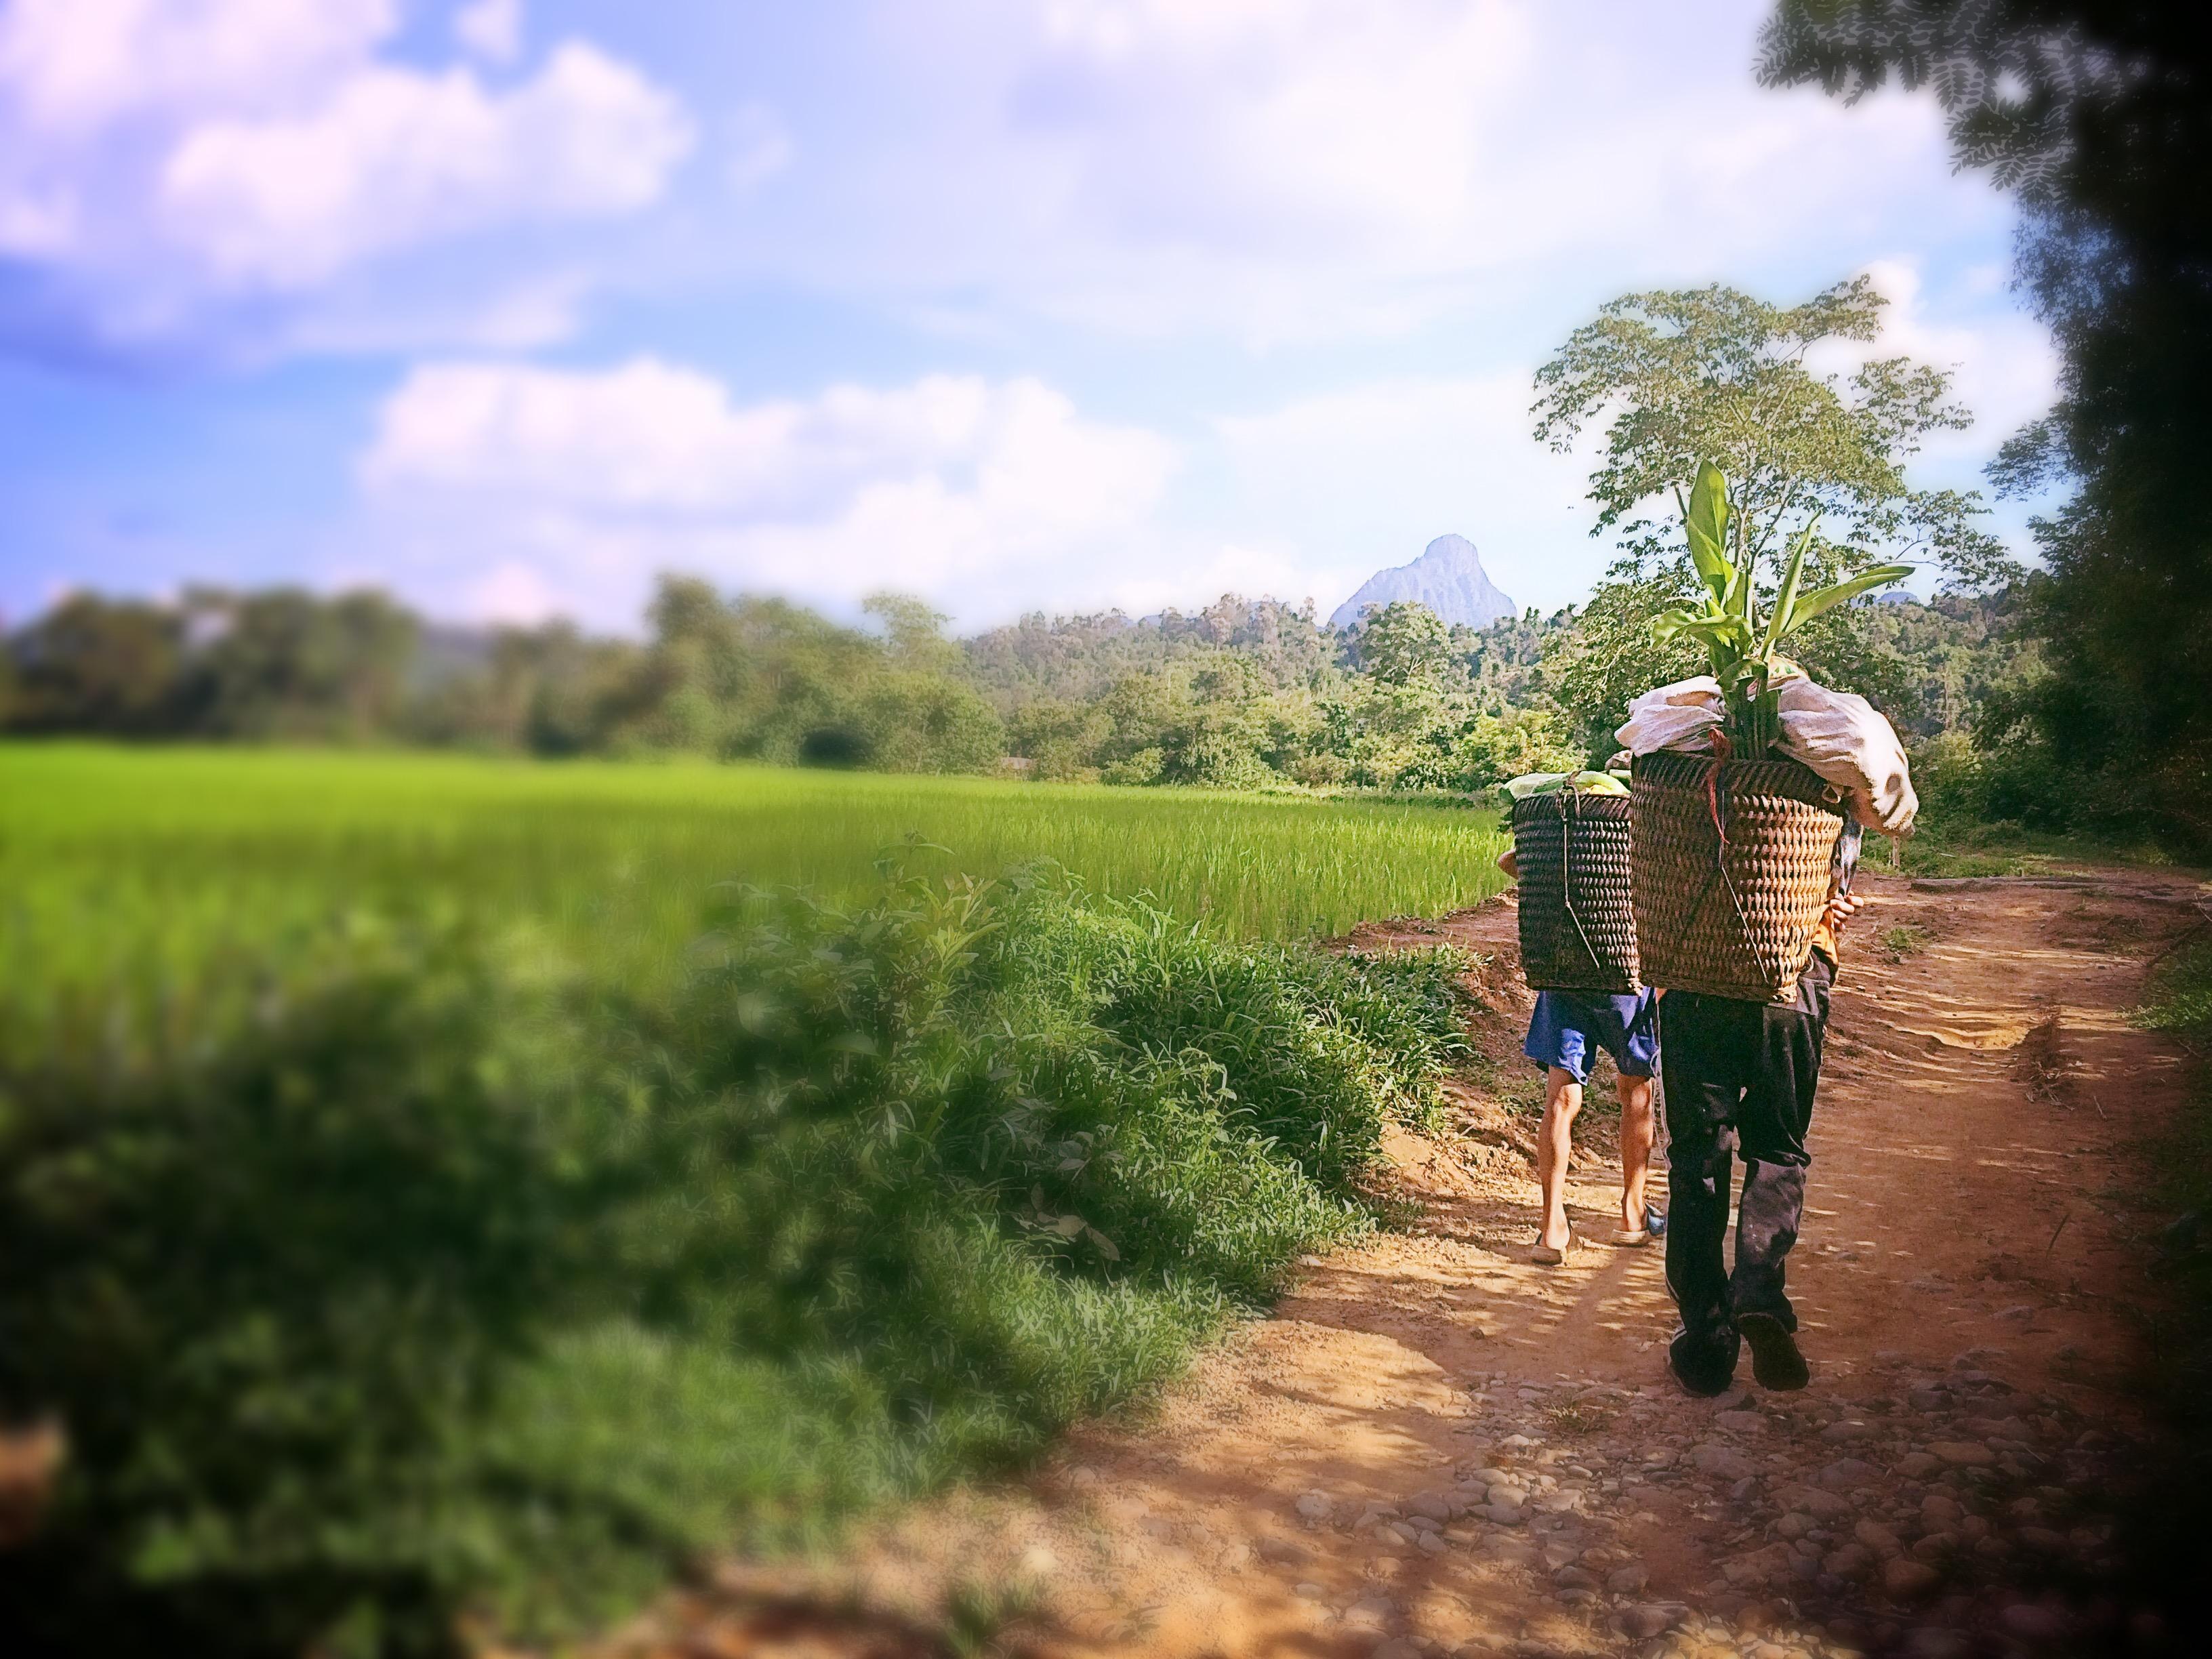 Instan-taneas de Vang Vieng. Laos